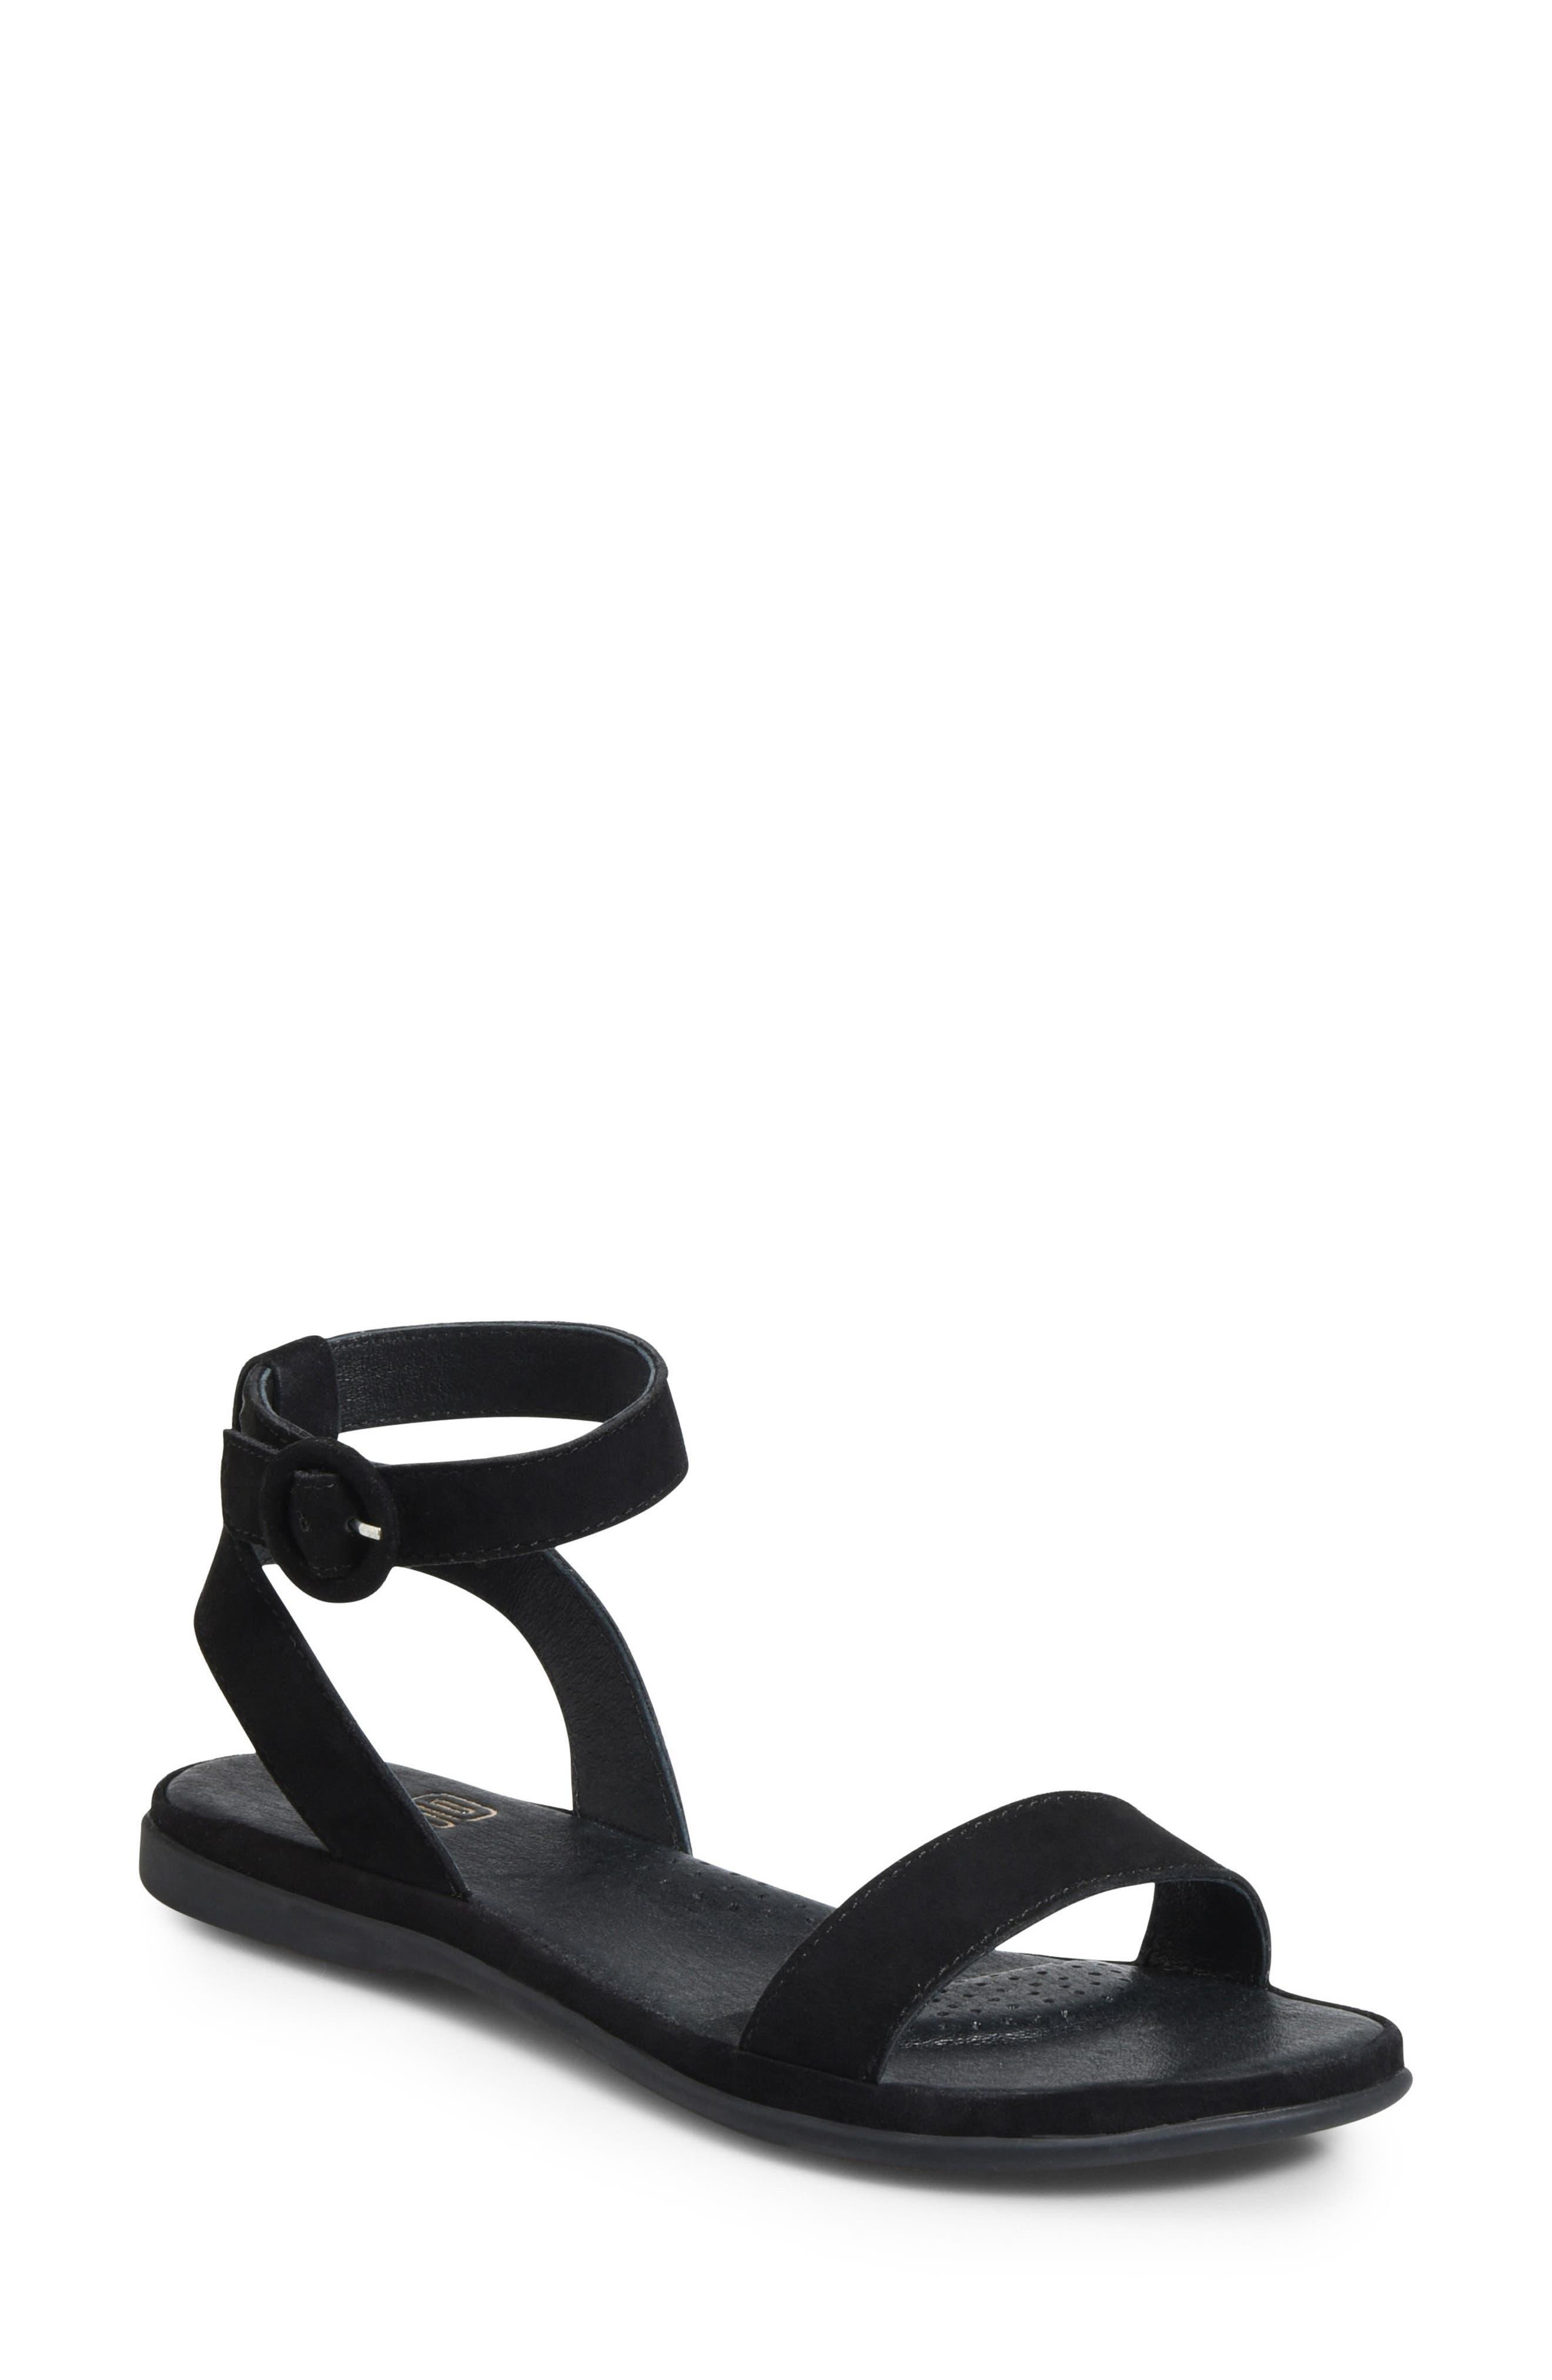 Stellan Sandal,                         Main,                         color, BLACK SUEDE